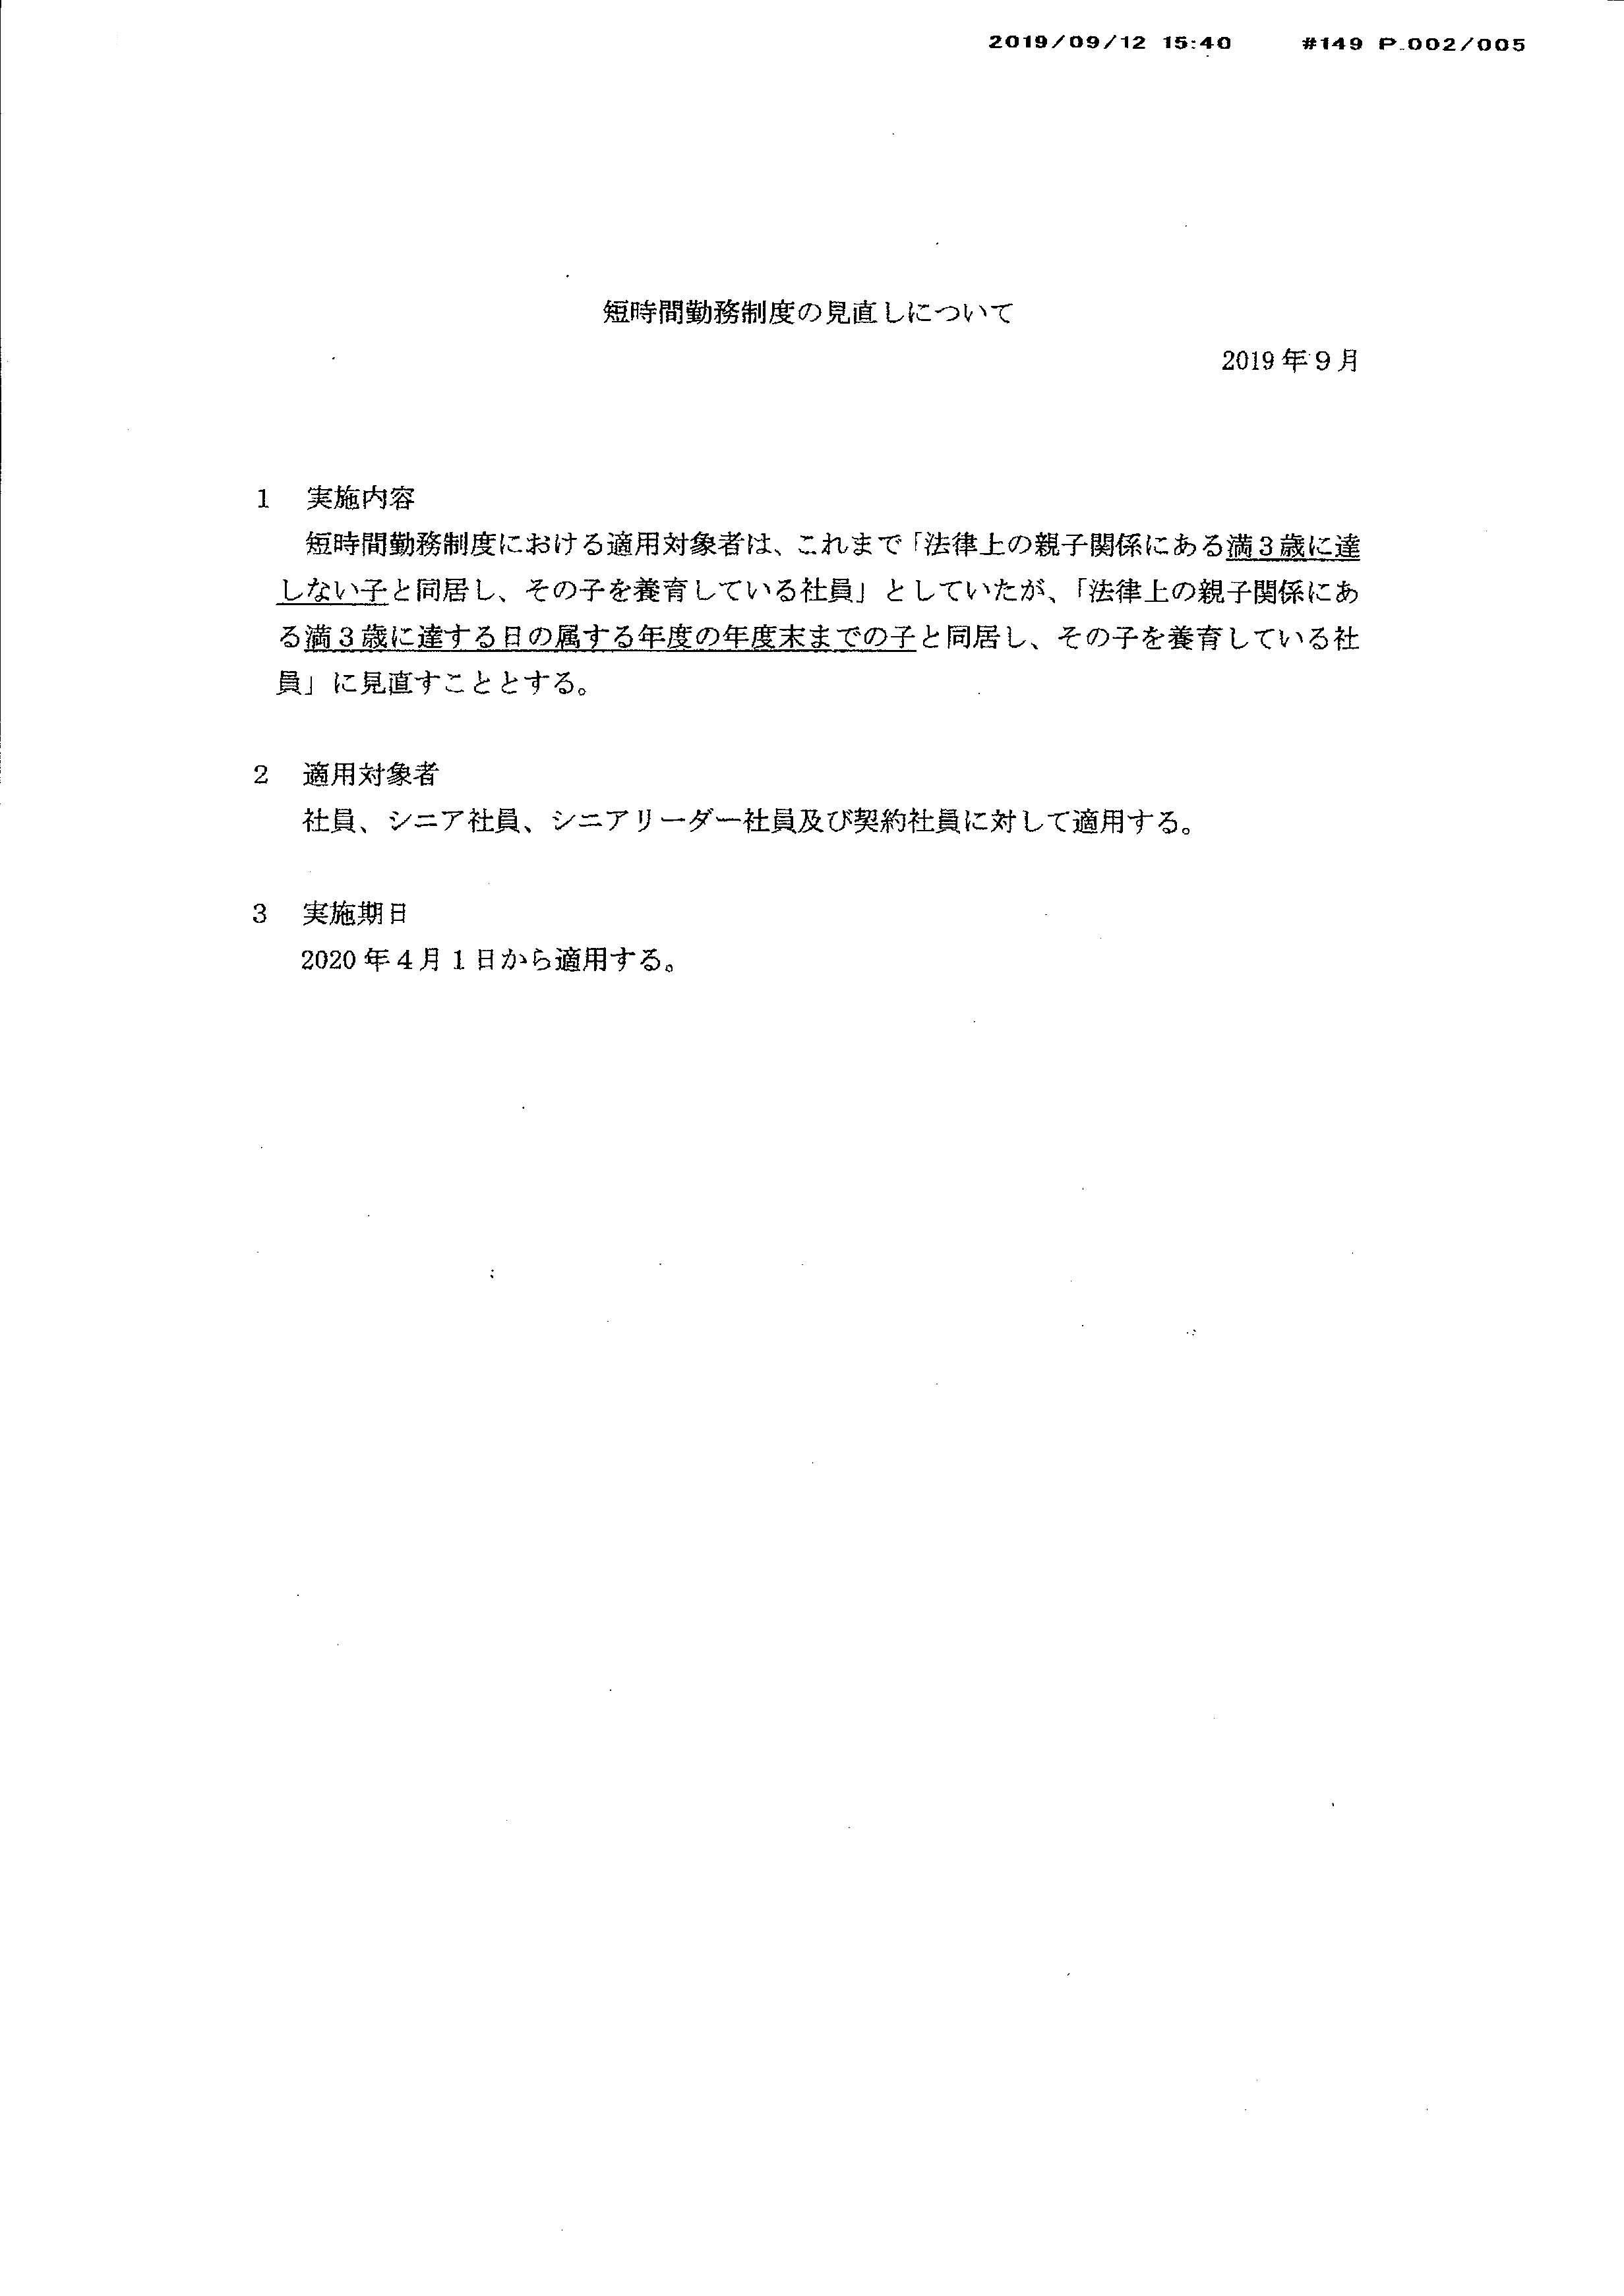 JR西日本の施策~治療支援休暇の対象拡大について、短時間勤務制度の見直しについて、再就職支援の見直しについて、テレワーク制度の本施行について、健康経営の取組みについて_d0155415_11375279.jpg